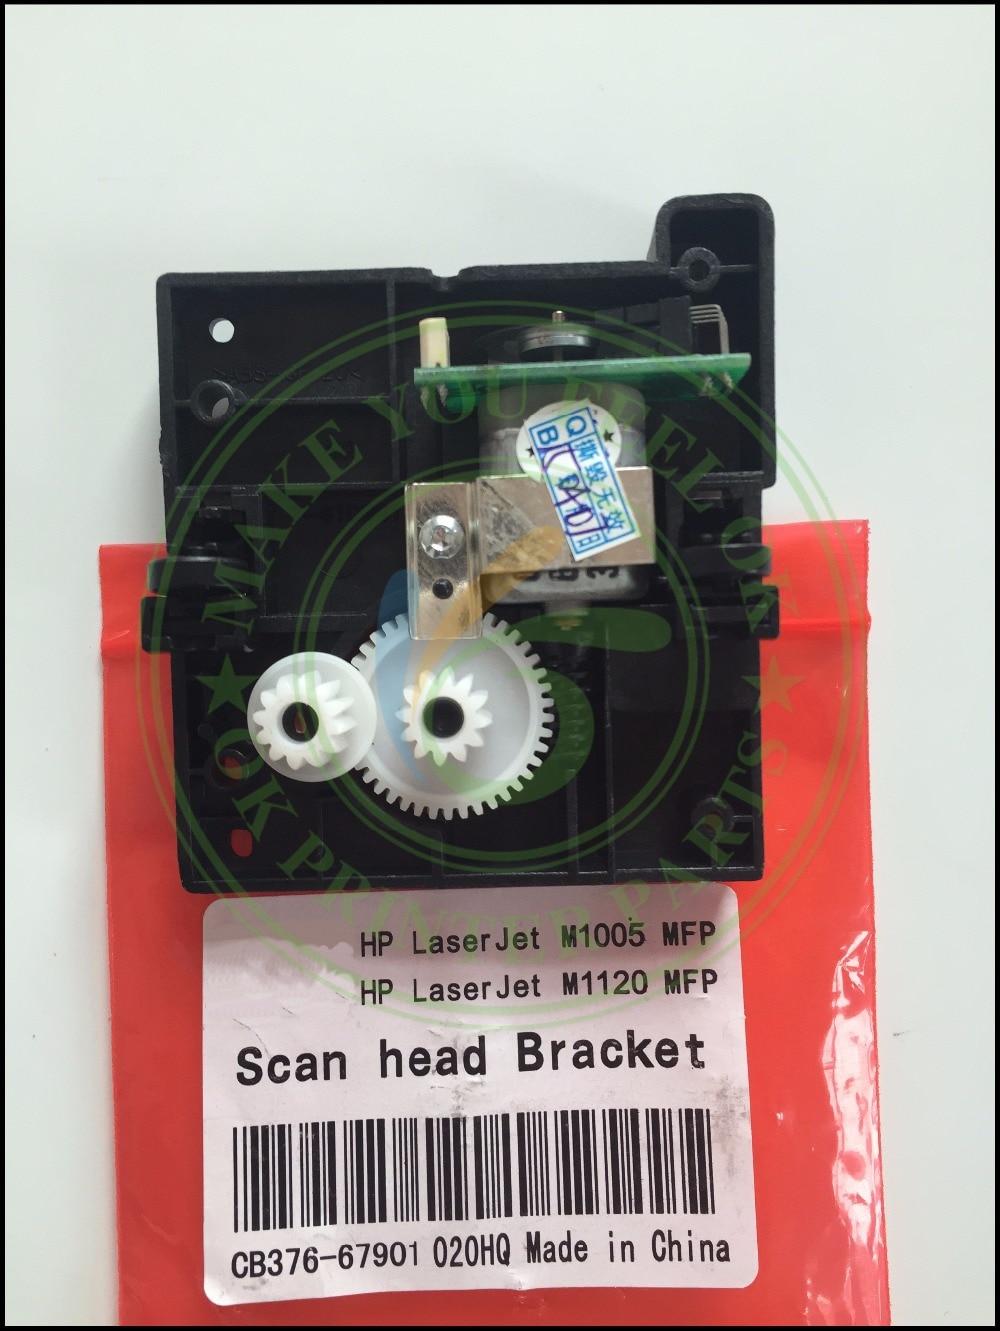 CB376 67901 Scanner Head Bracket assembly Scanner Unit scanner motor gear assy for HP M1005 M1120